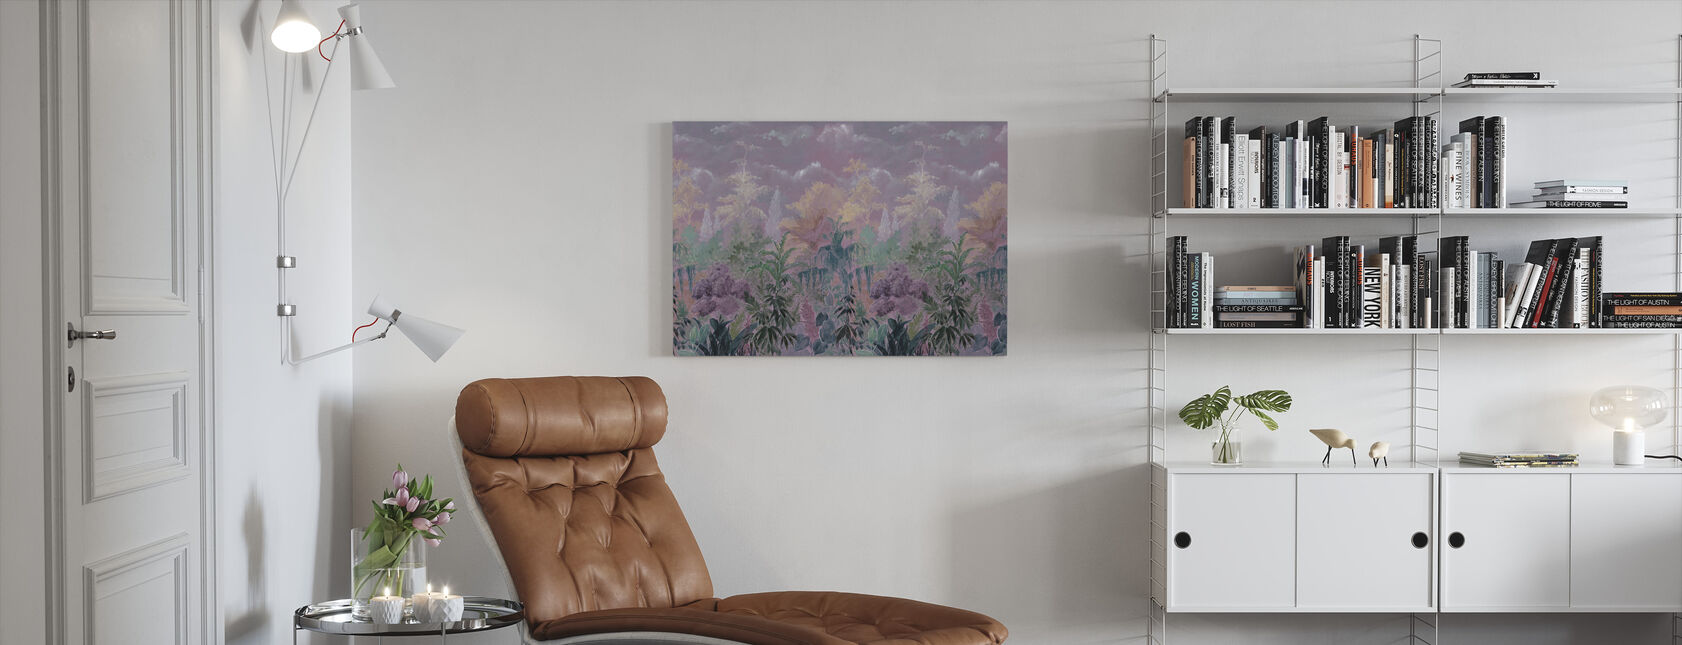 Flourishing Vegetation - Canvas print - Living Room